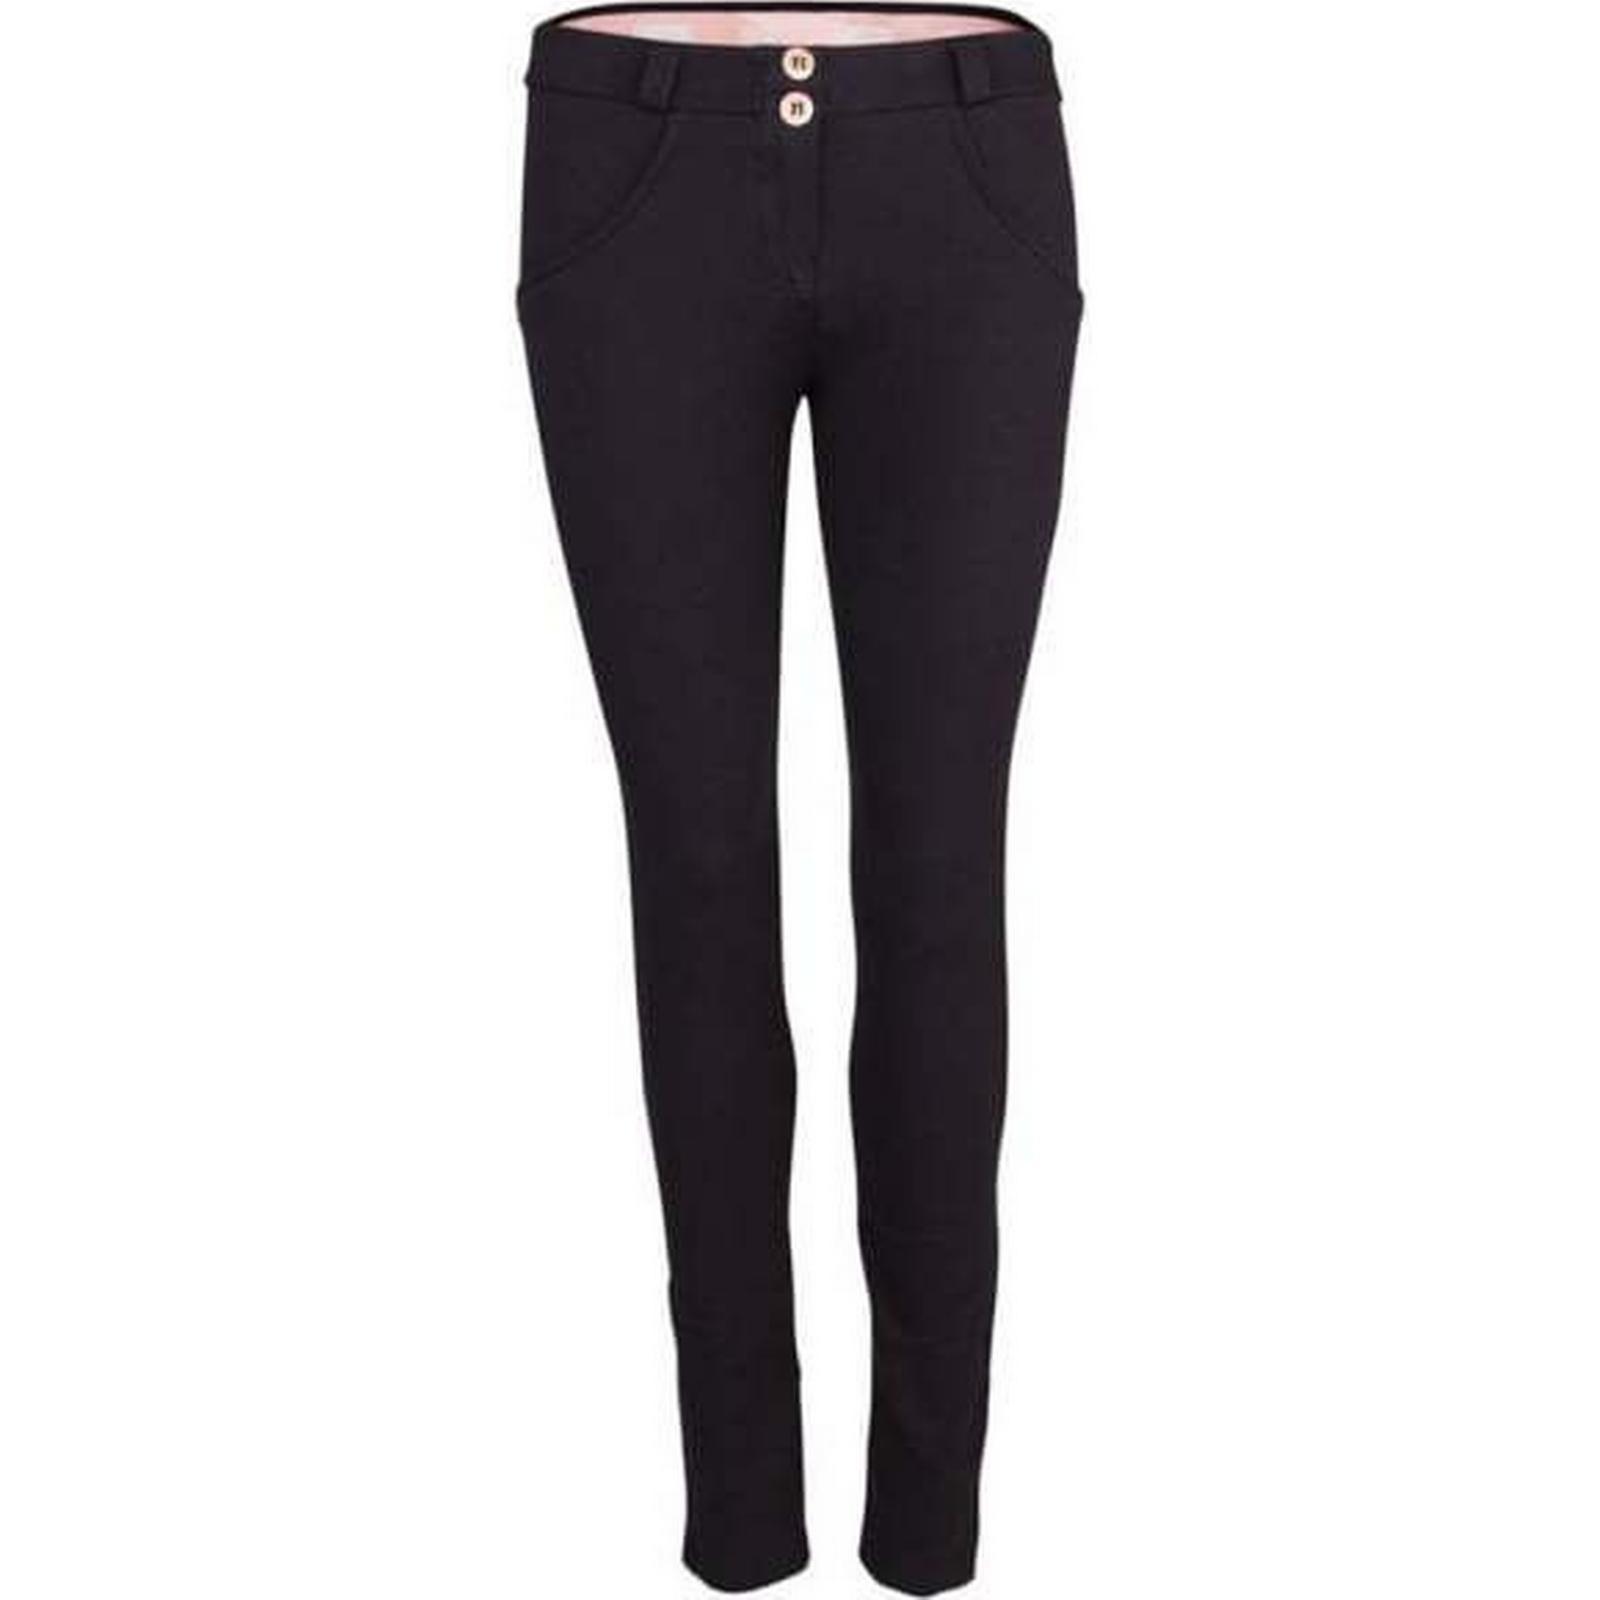 Freddy Womens Basic Black Mid Rise Skinny Size: Jeans Size: Skinny L 187308